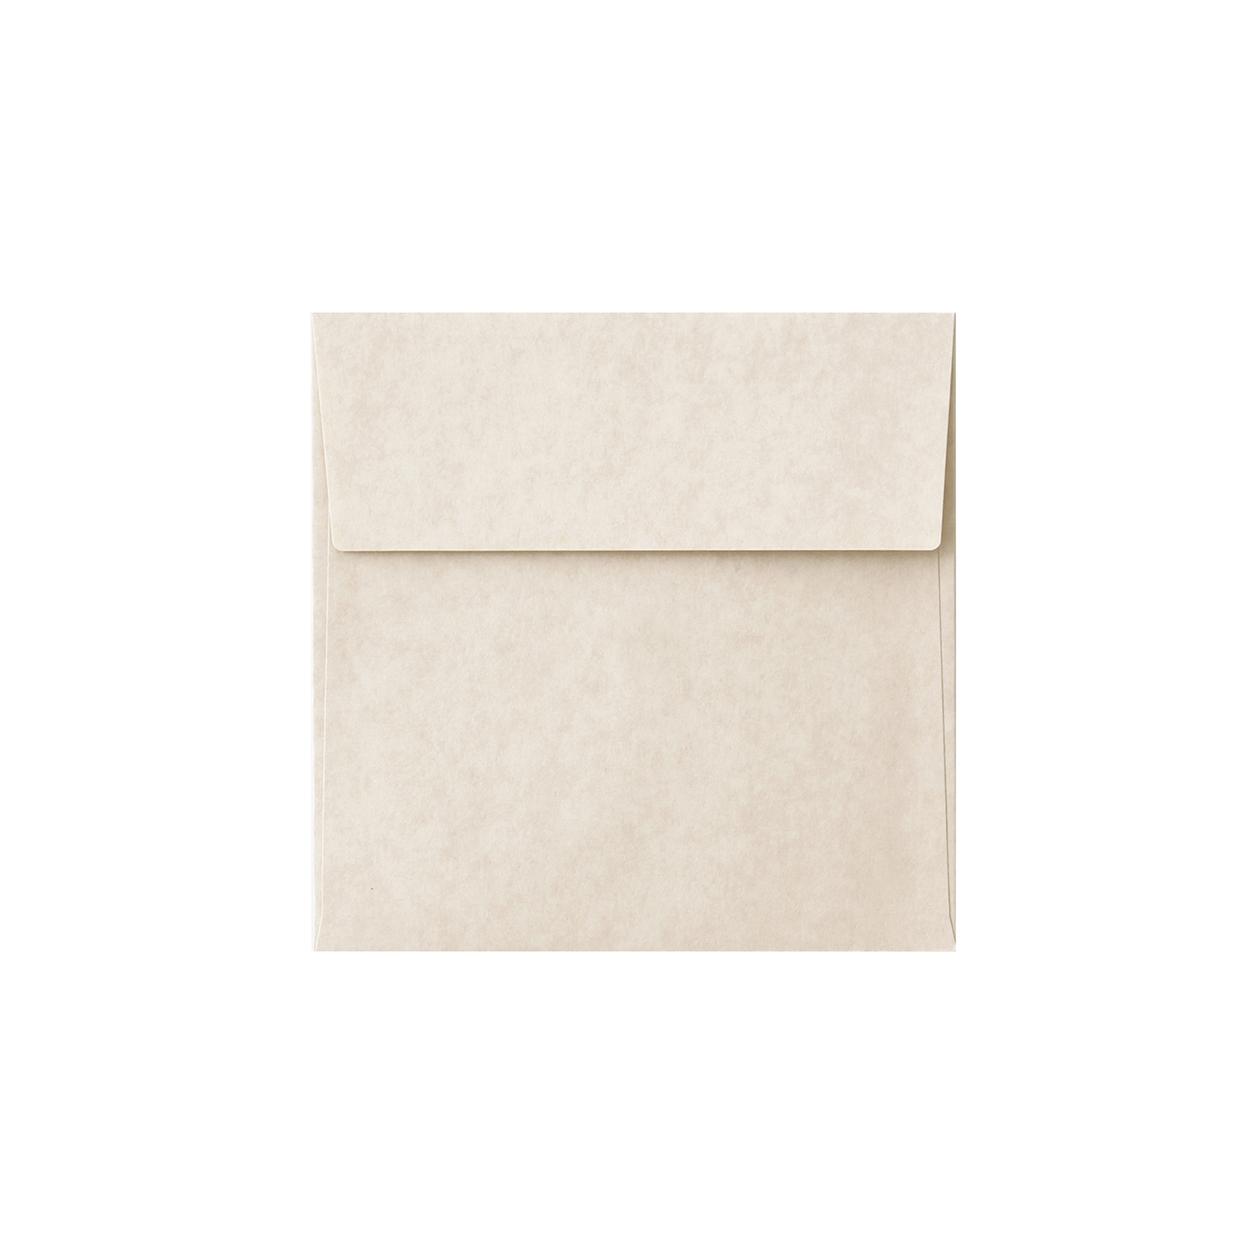 SE12.5カマス封筒 ホワイトクラフト 100g